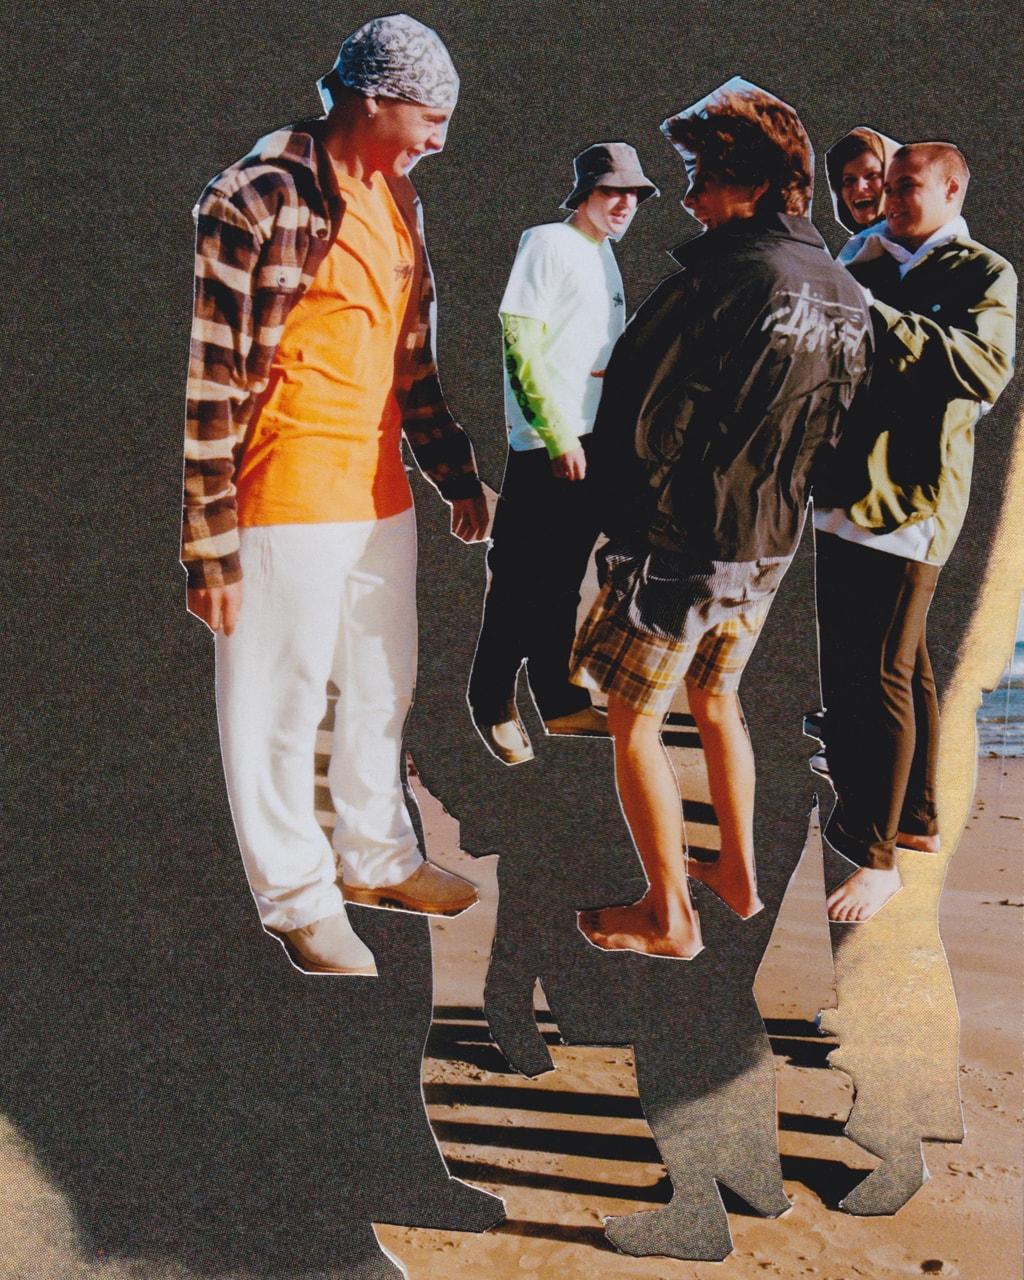 Supreme Spring Summer 2021 Week 7 Release Drop List Info Palace Skateboards 9  Bodega Awake NY Carhartt WIP PLEASURES PRMTVO thisisneverthat KOREATOWN VENUM UFC Cactus Plant Flea Market Nike Disney Mickey Mouse Keith Haring Levi's Patta Tommy Hilfiger Stüssy Our Legacy